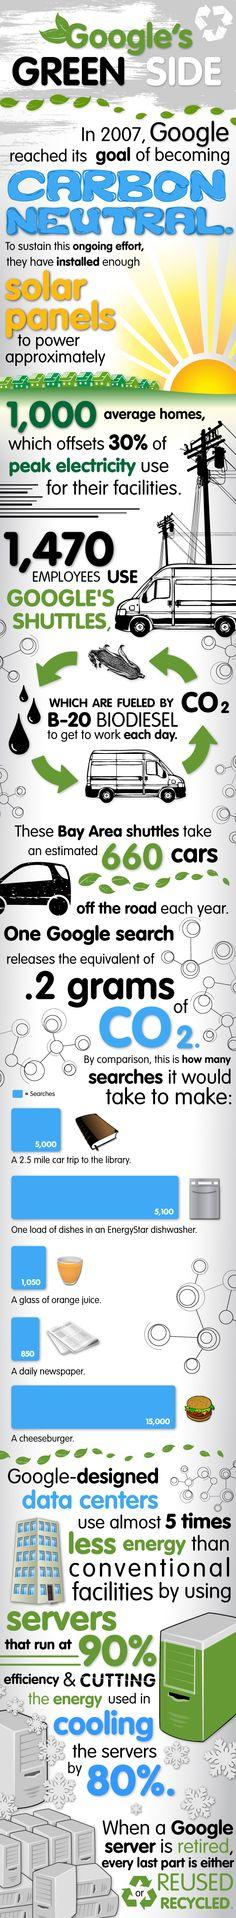 Google's green side...